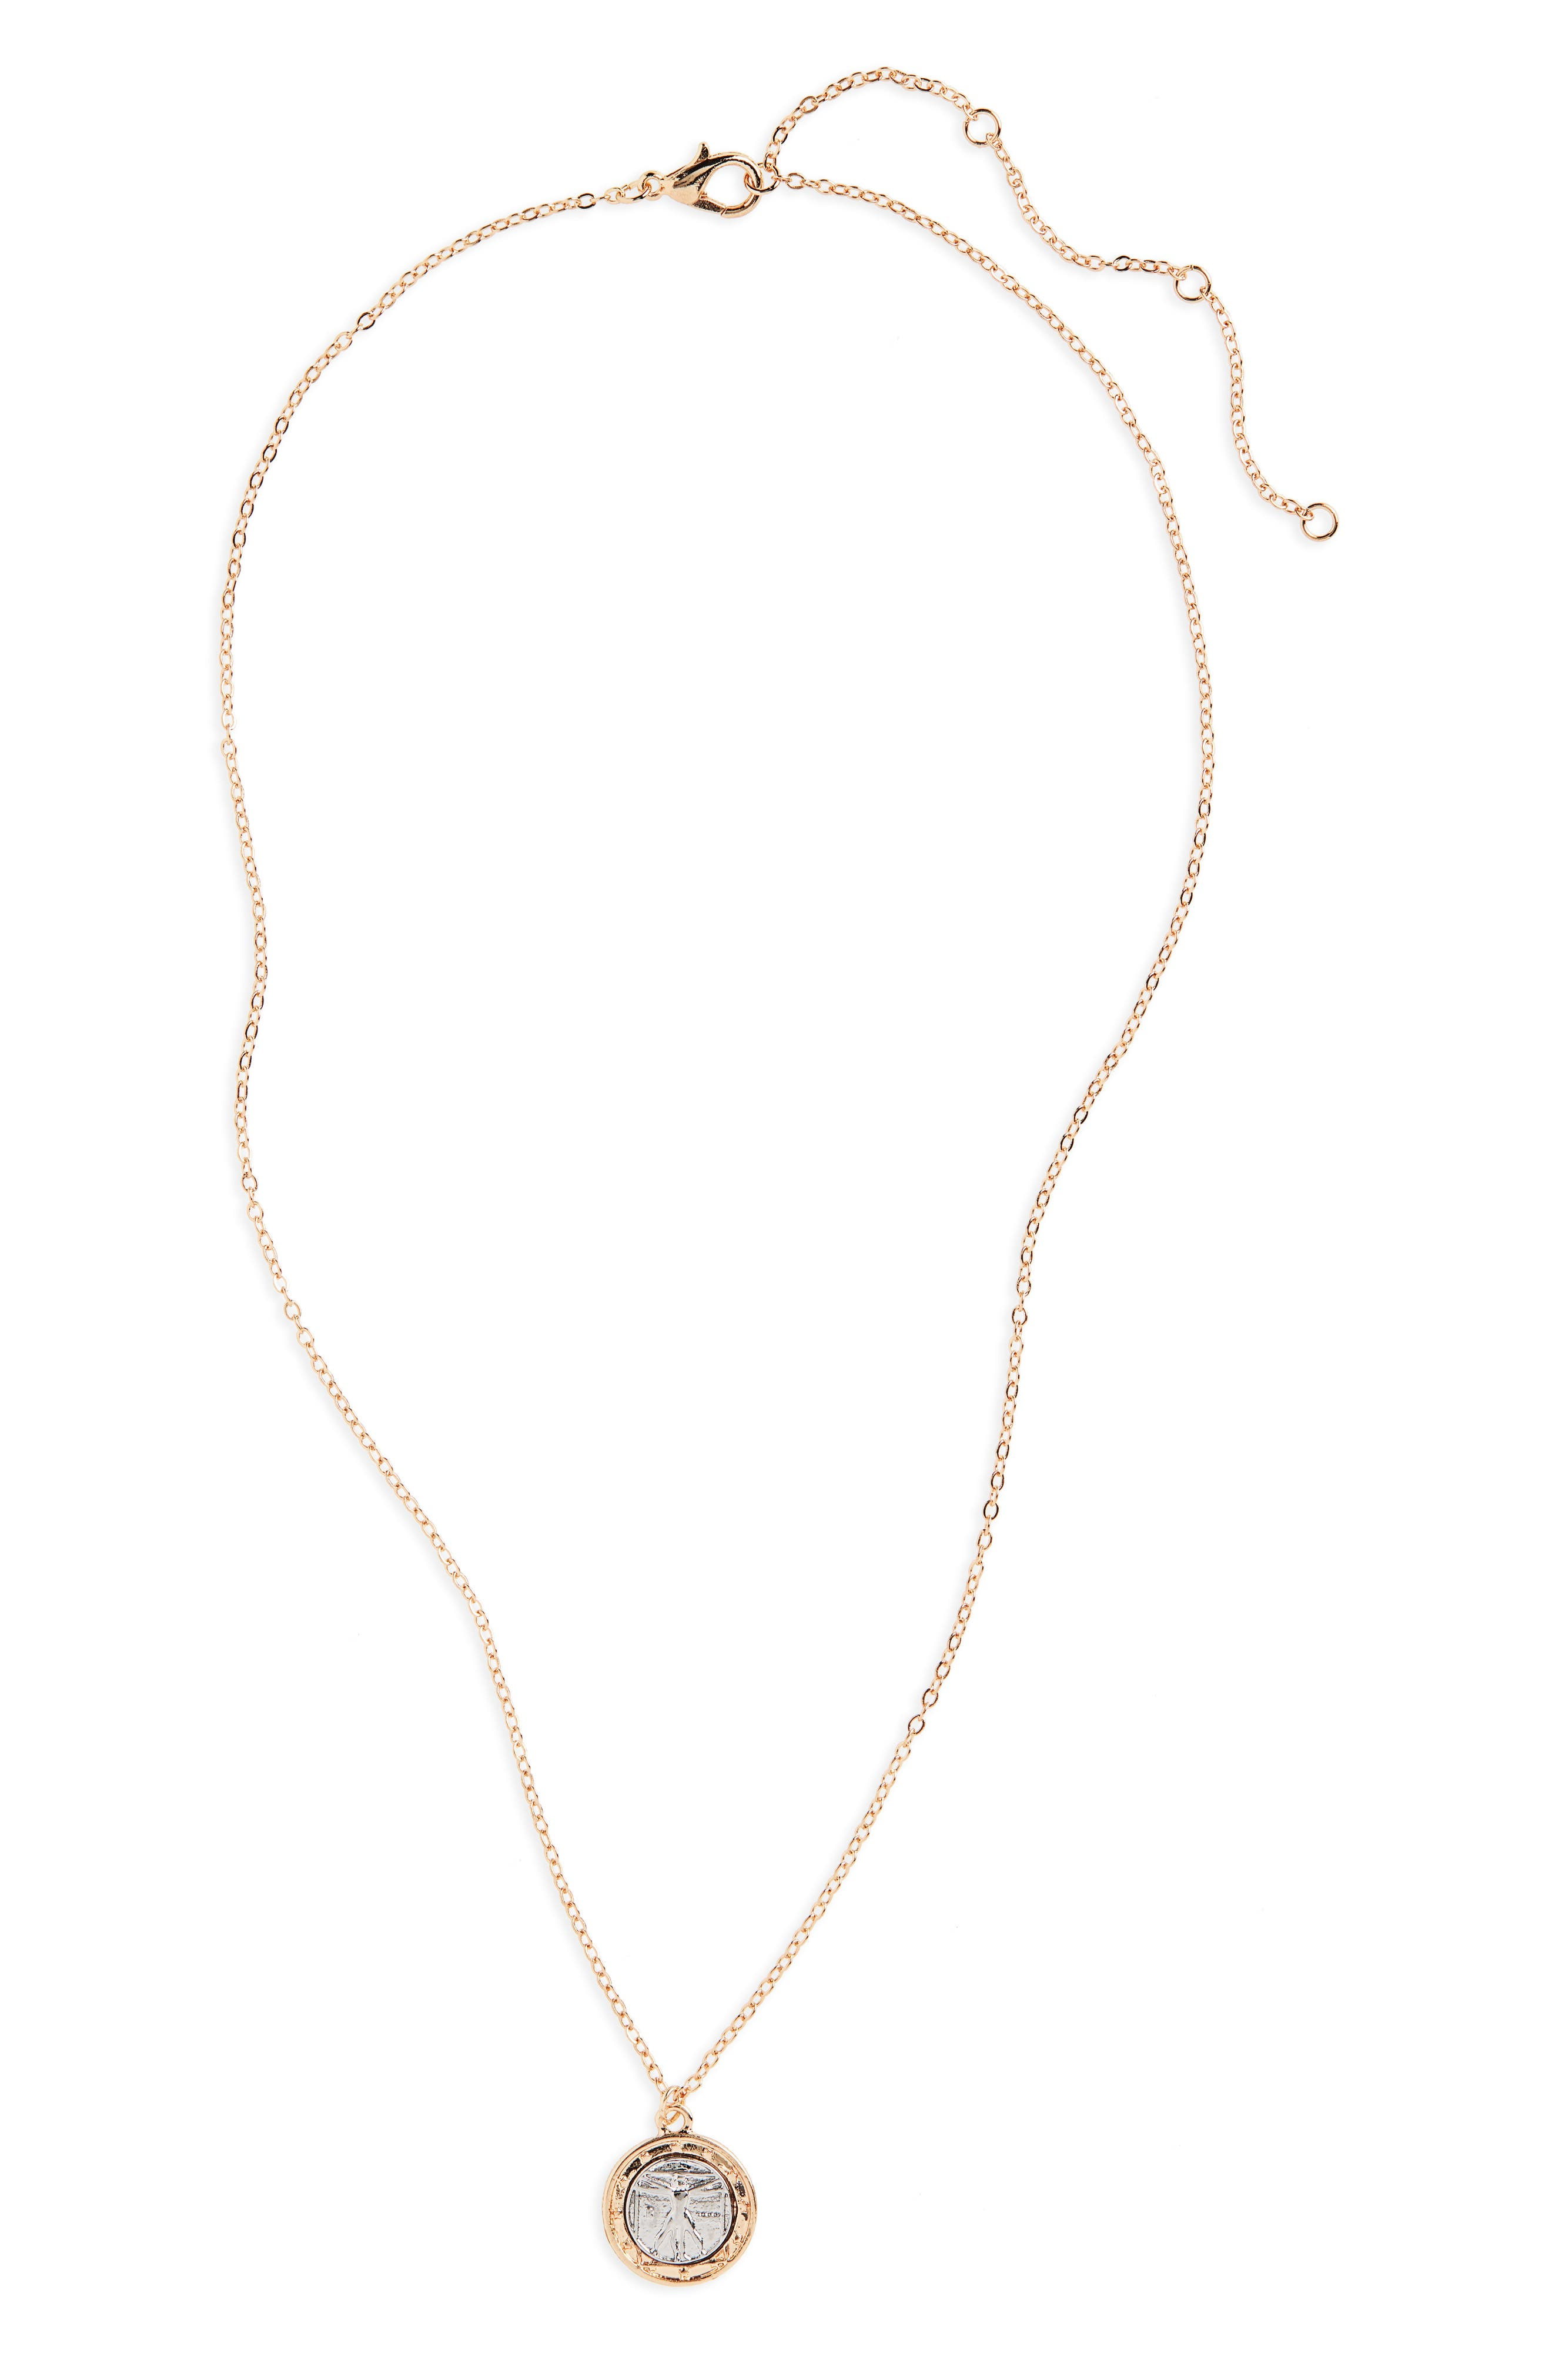 Form Charm Necklace,                             Main thumbnail 1, color,                             710